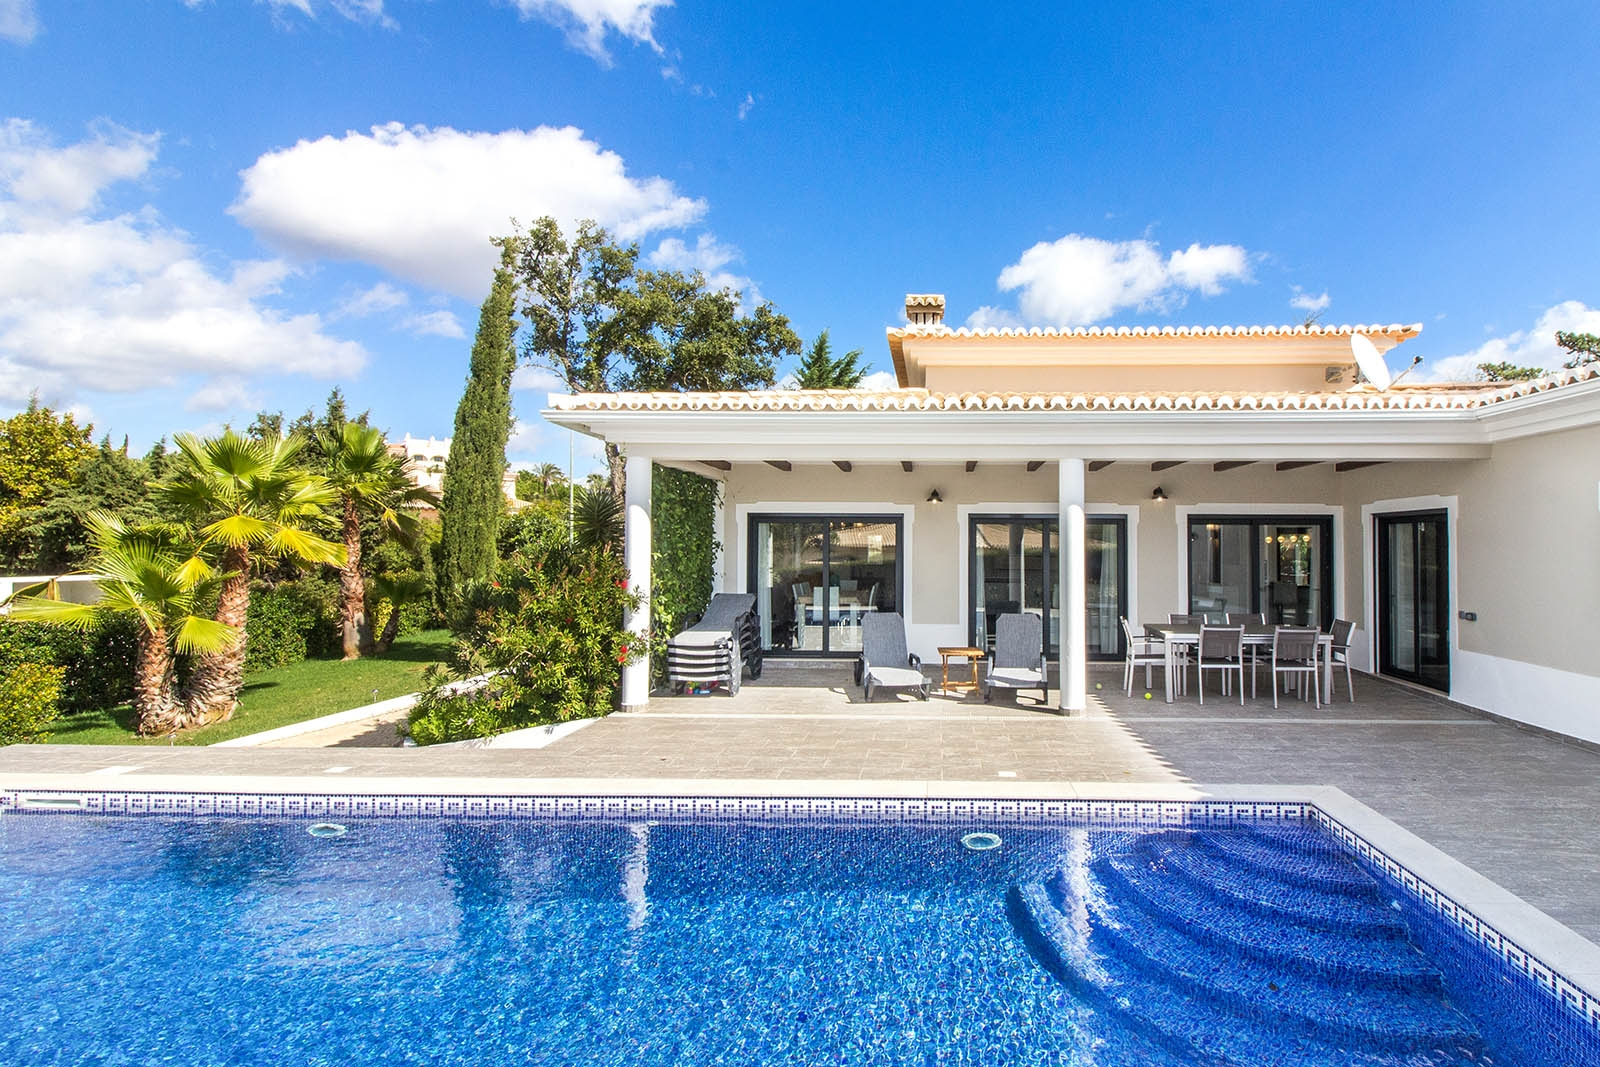 Beatriz Santos | Real Estate and Interior Photogra (@beatrizsantosphoto) Cover Image